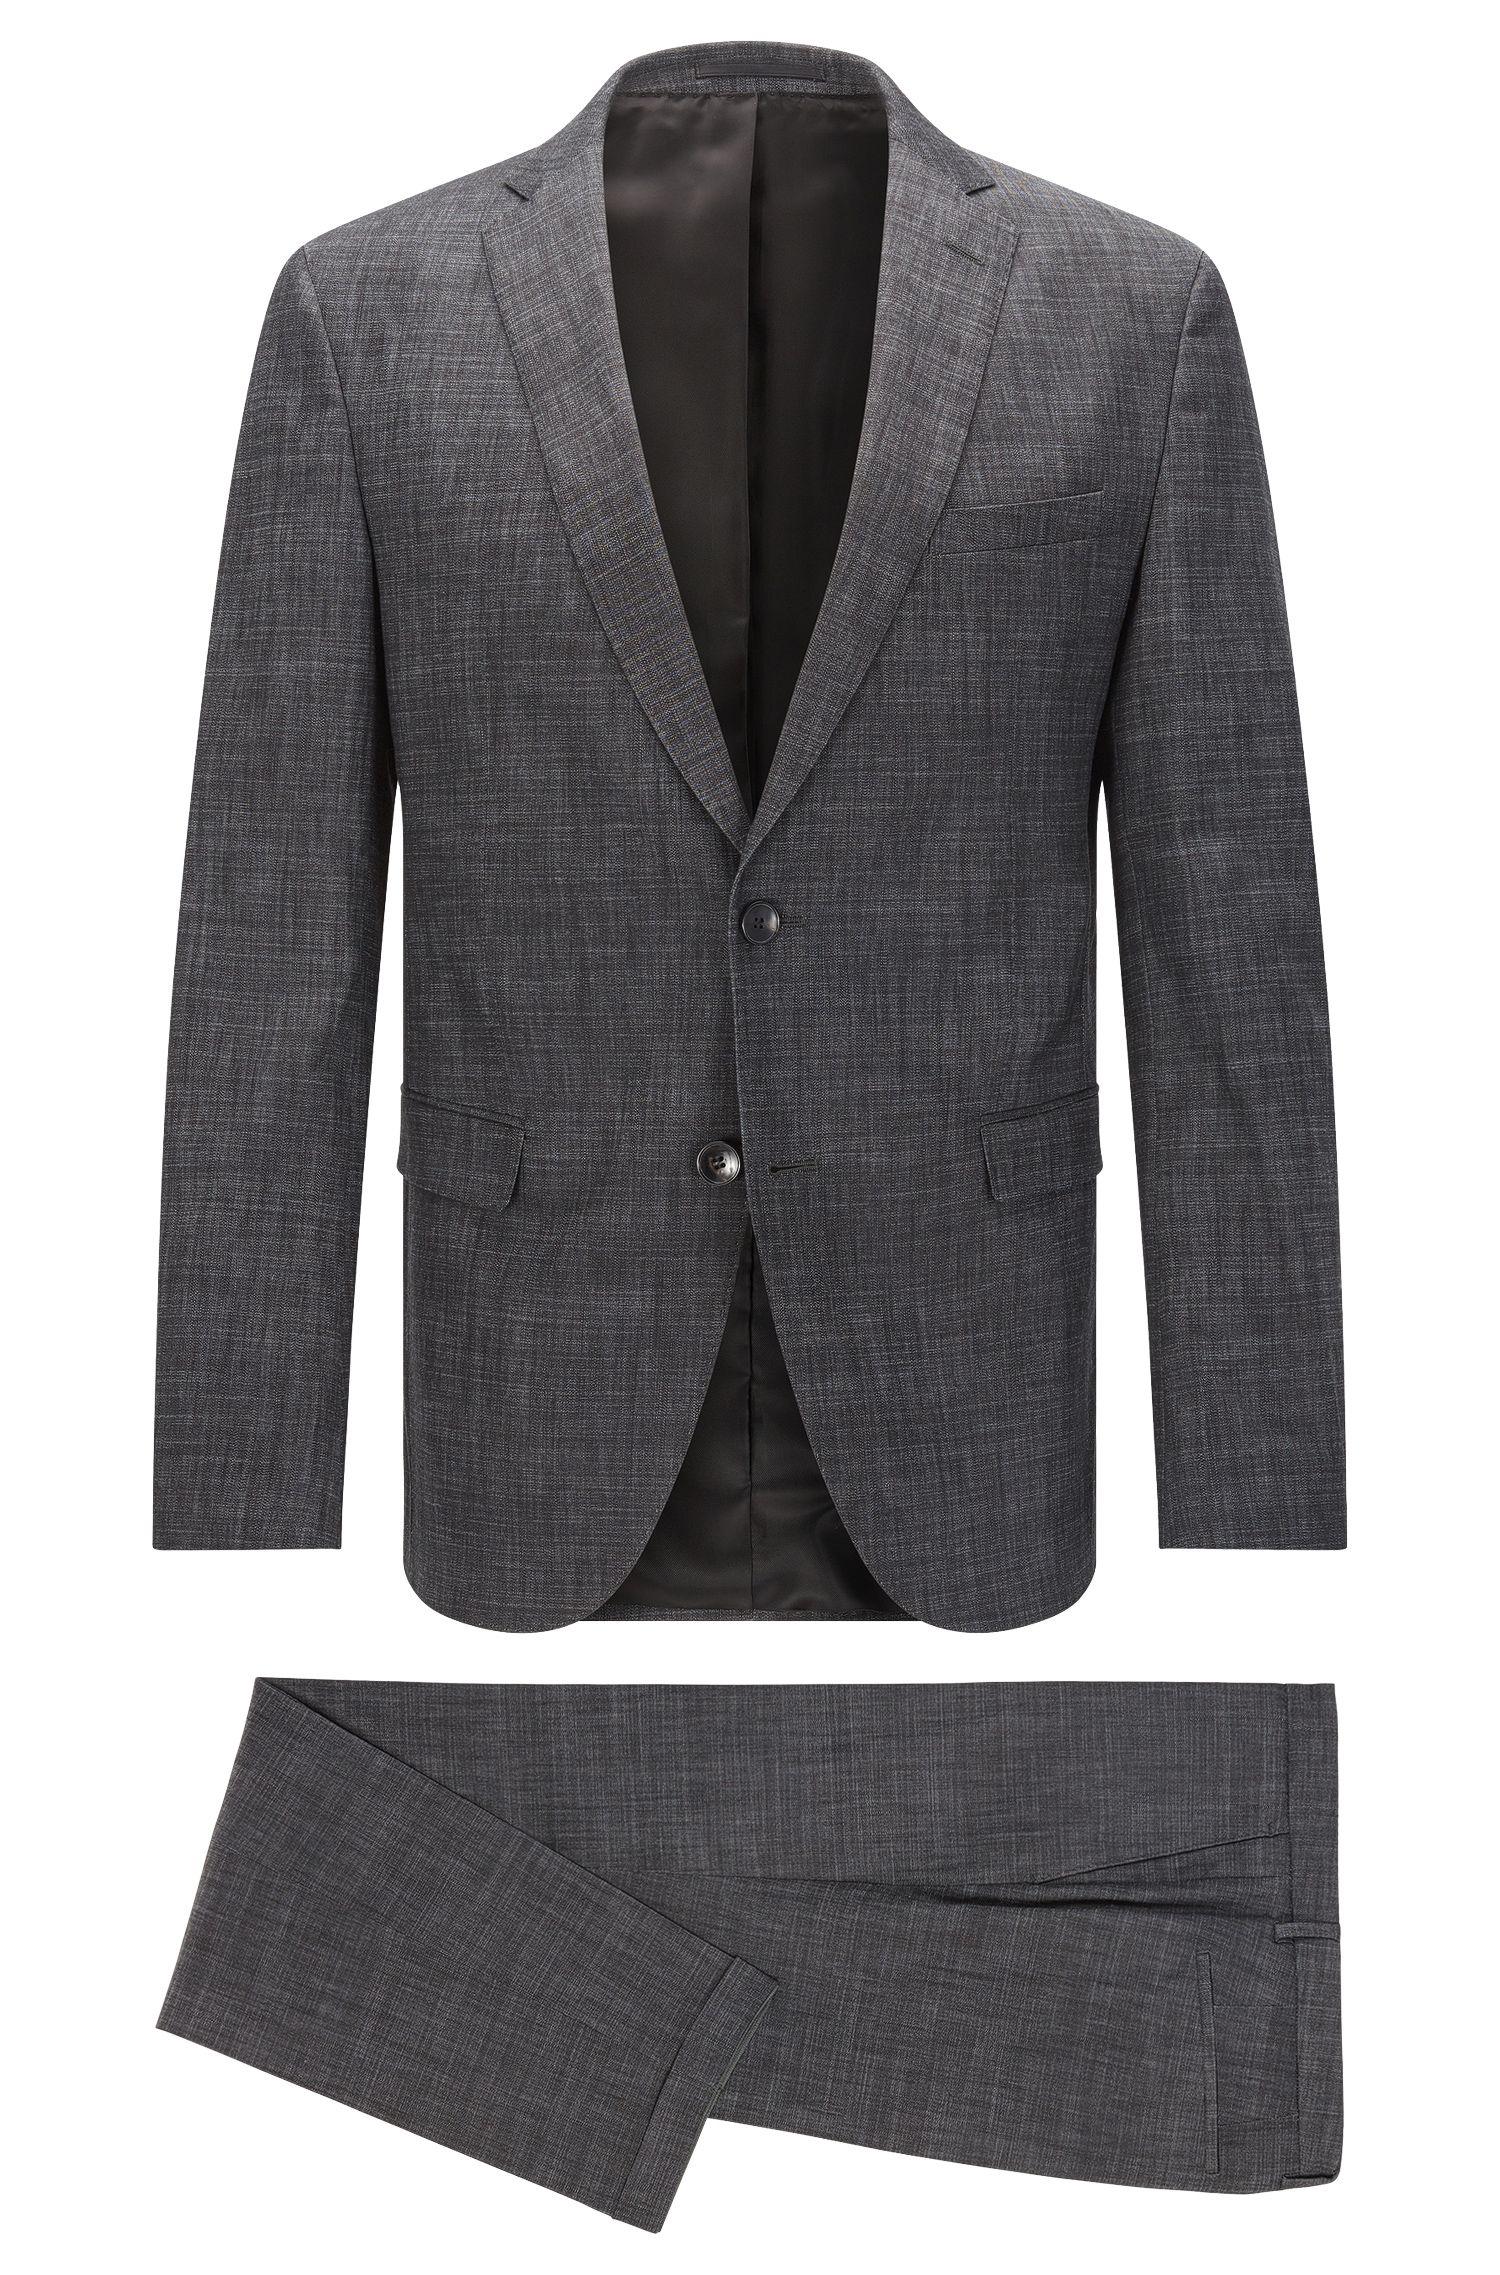 Crosshatch Stretch Cotton Blend Suit, Extra-Slim Fit | Reyno/Wave